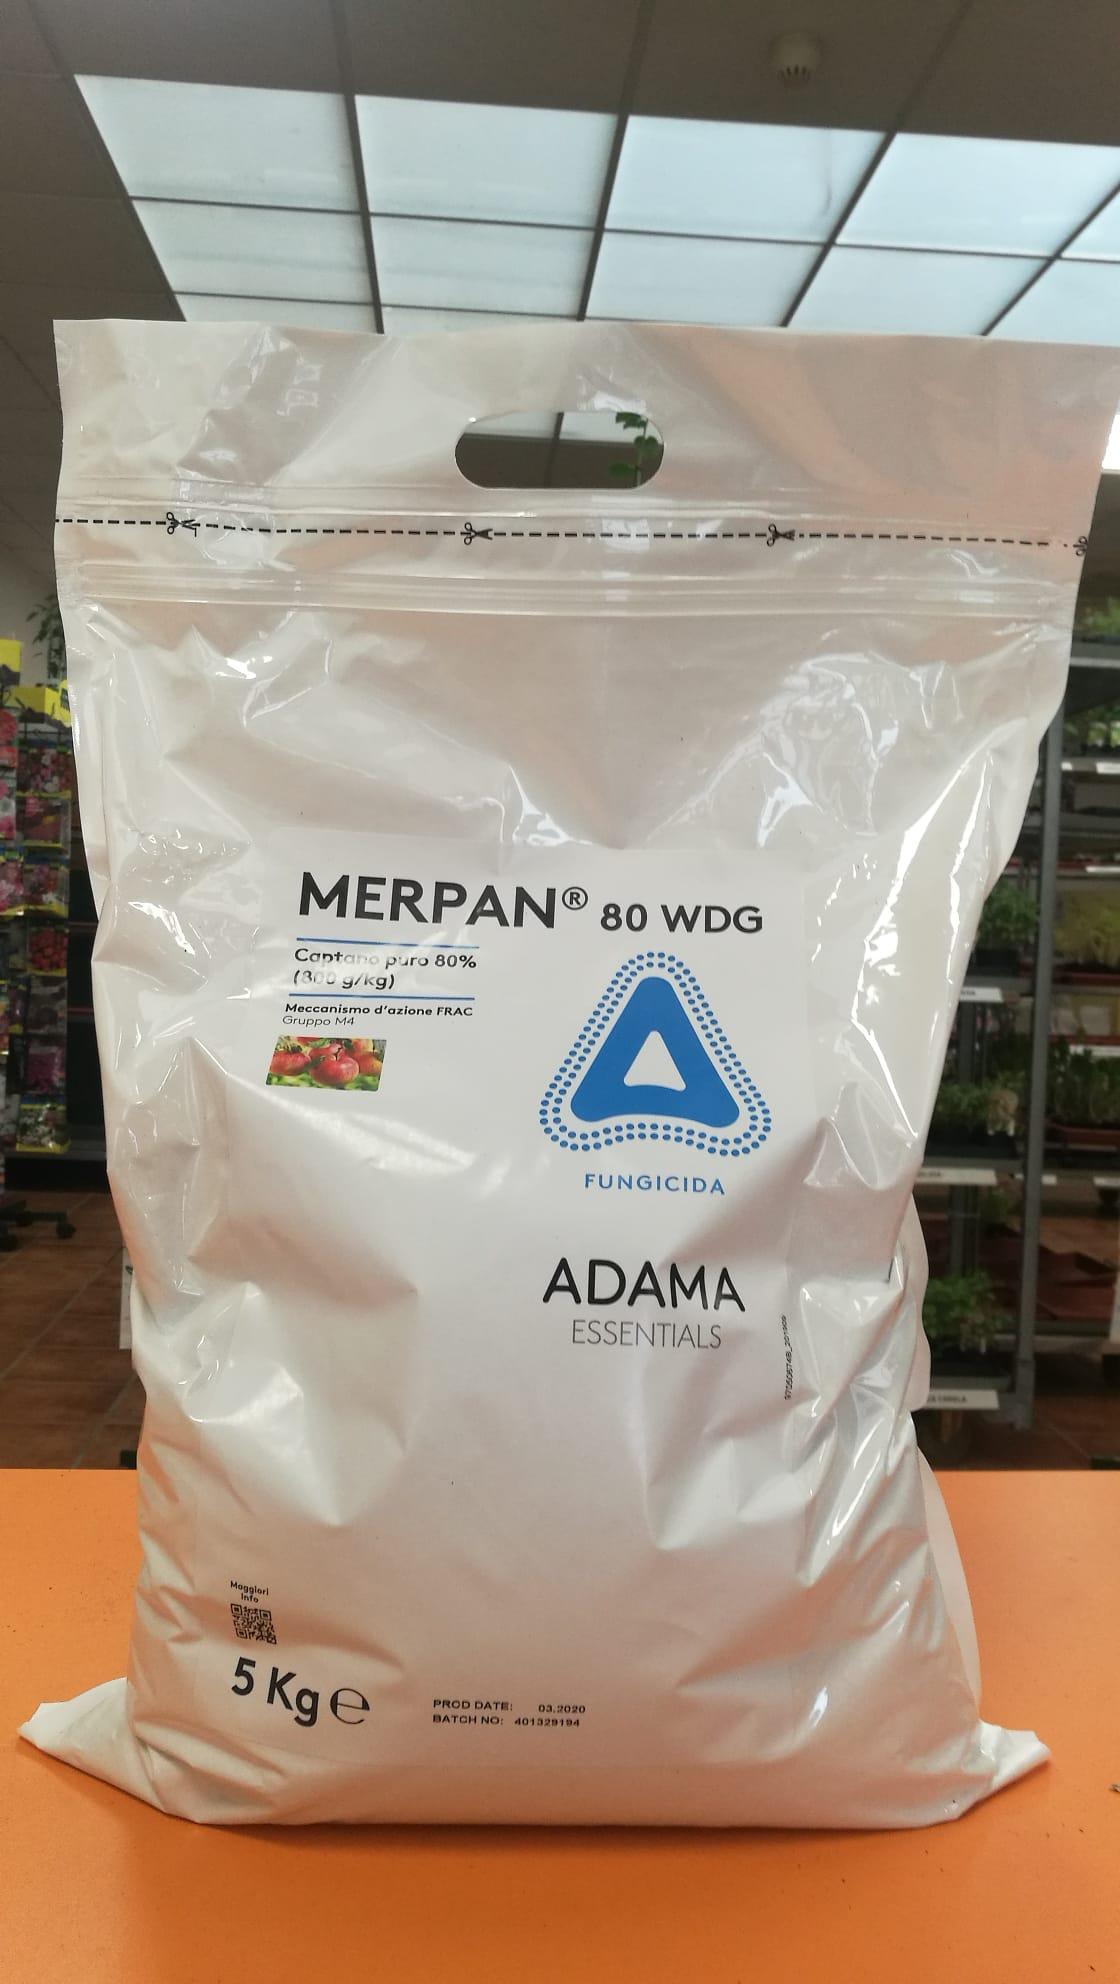 MERPAN 80 WDG (5 Kgr.).[R] [IA]